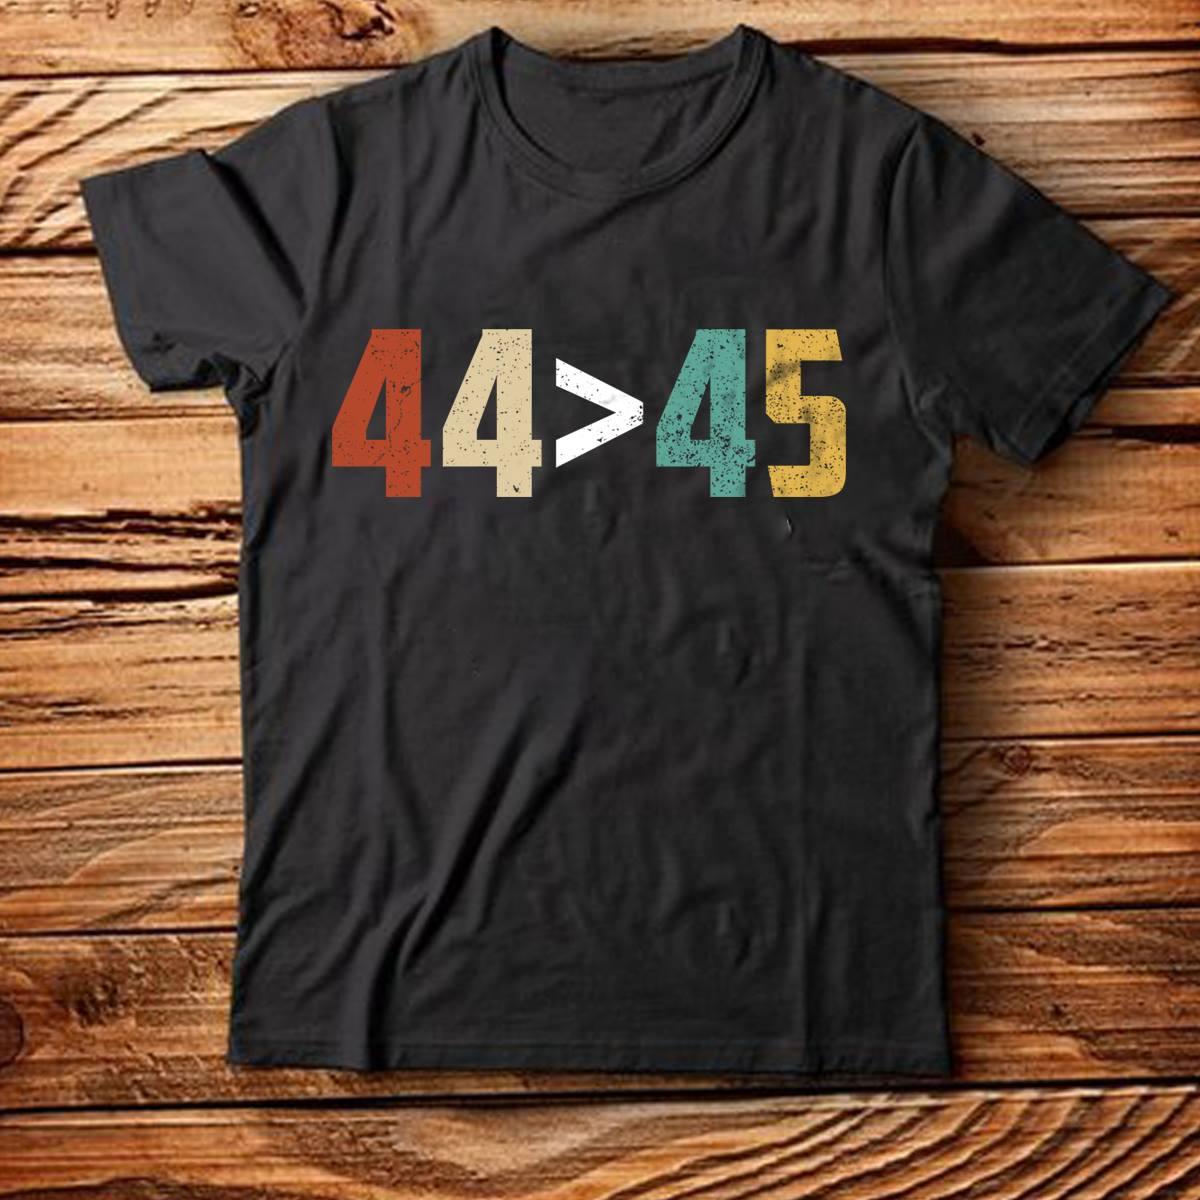 44 greater than 45 shirt